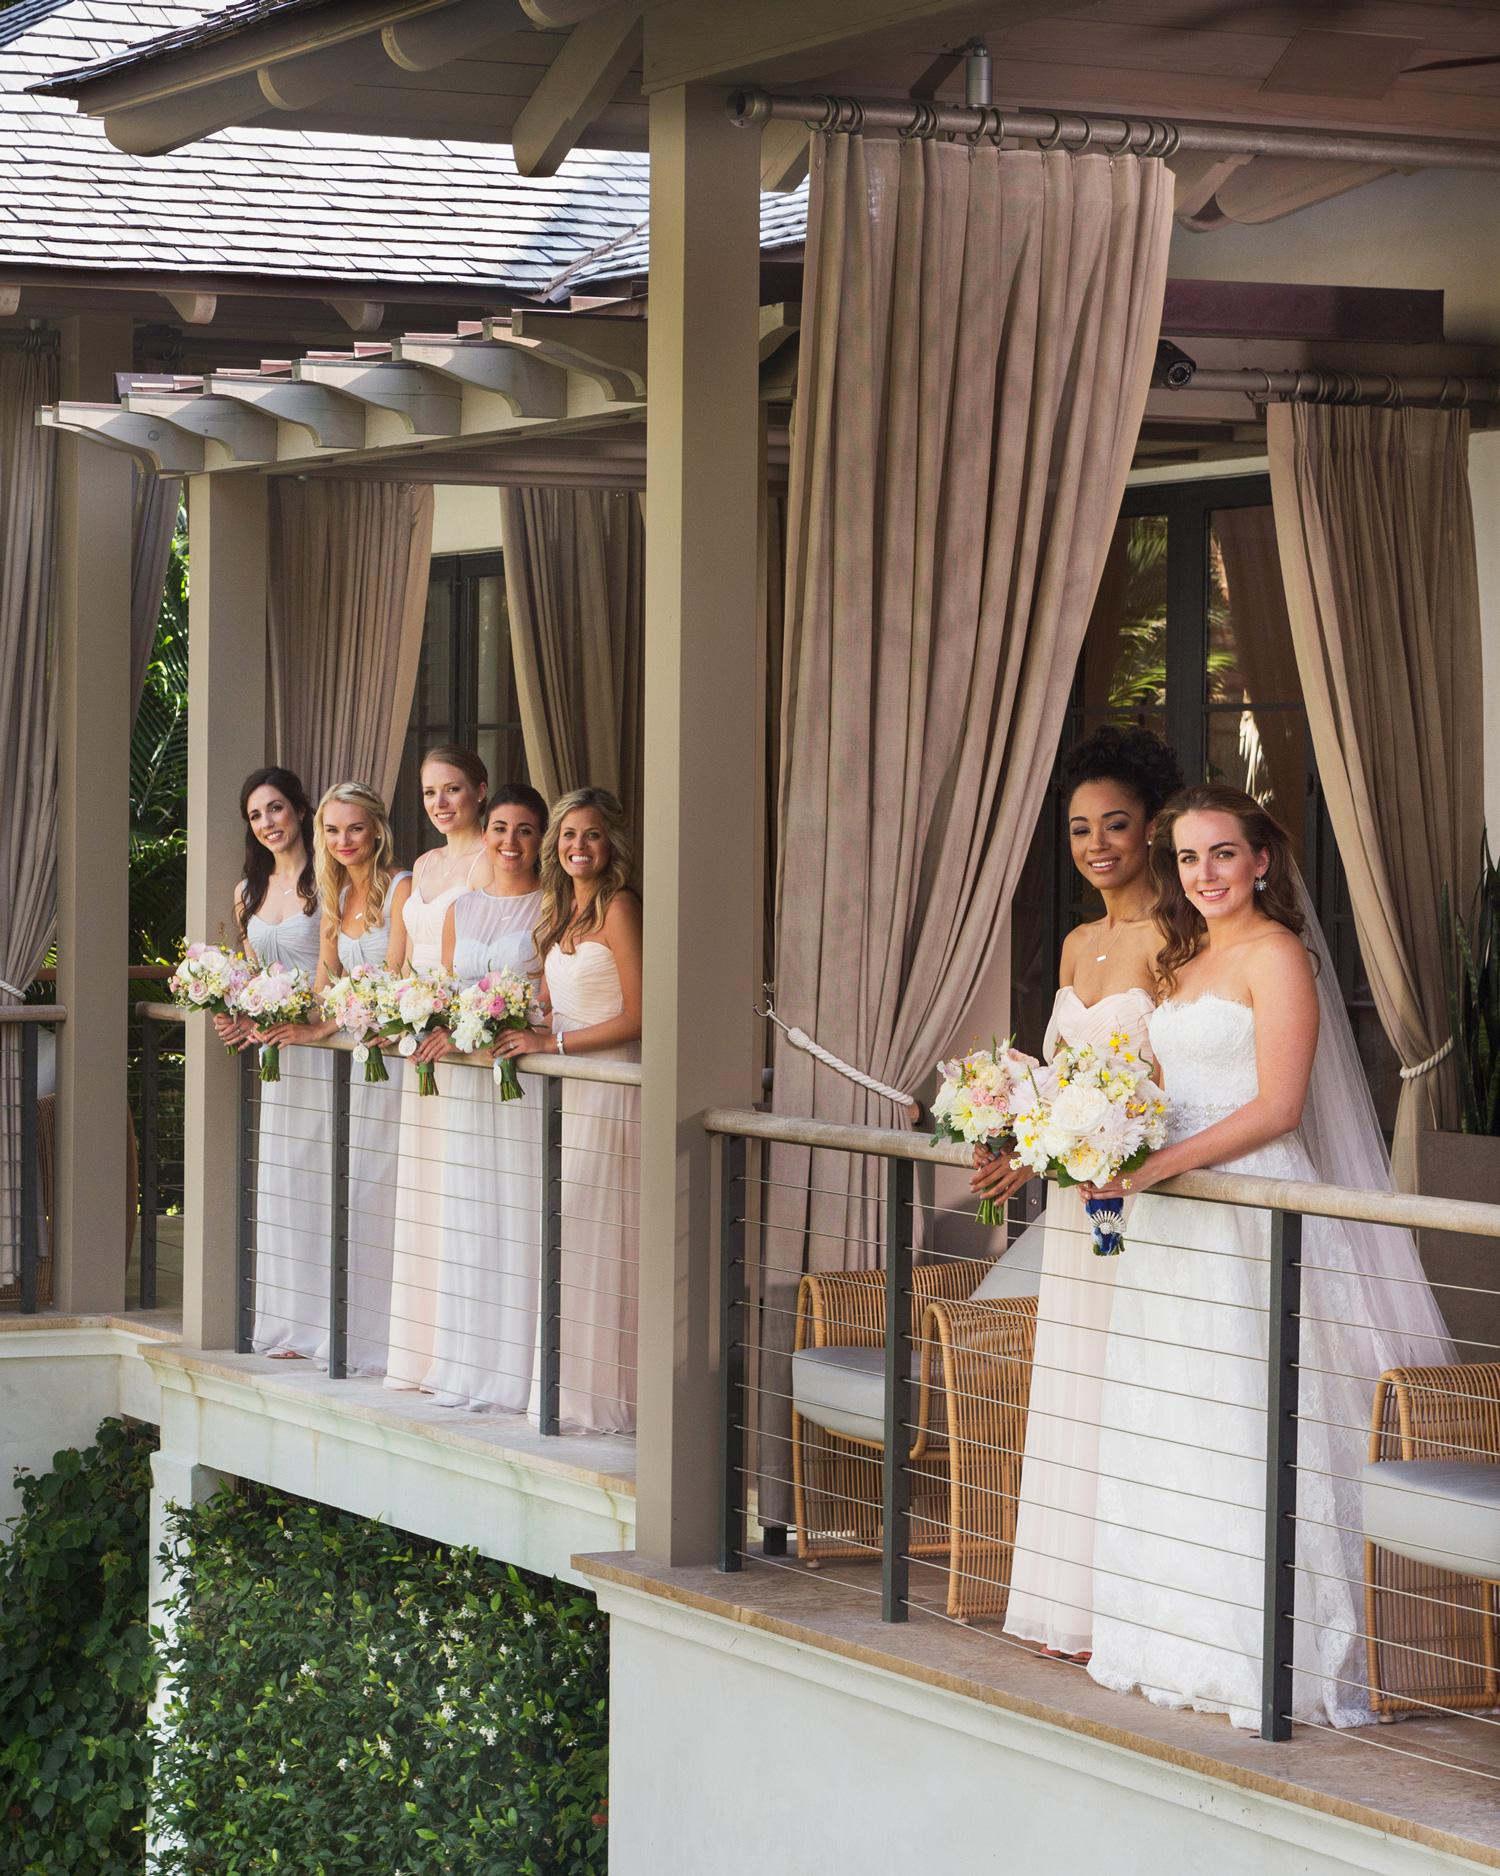 erin-ryan-florida-wedding-bridesmaids-0663-s113010-0516.jpg